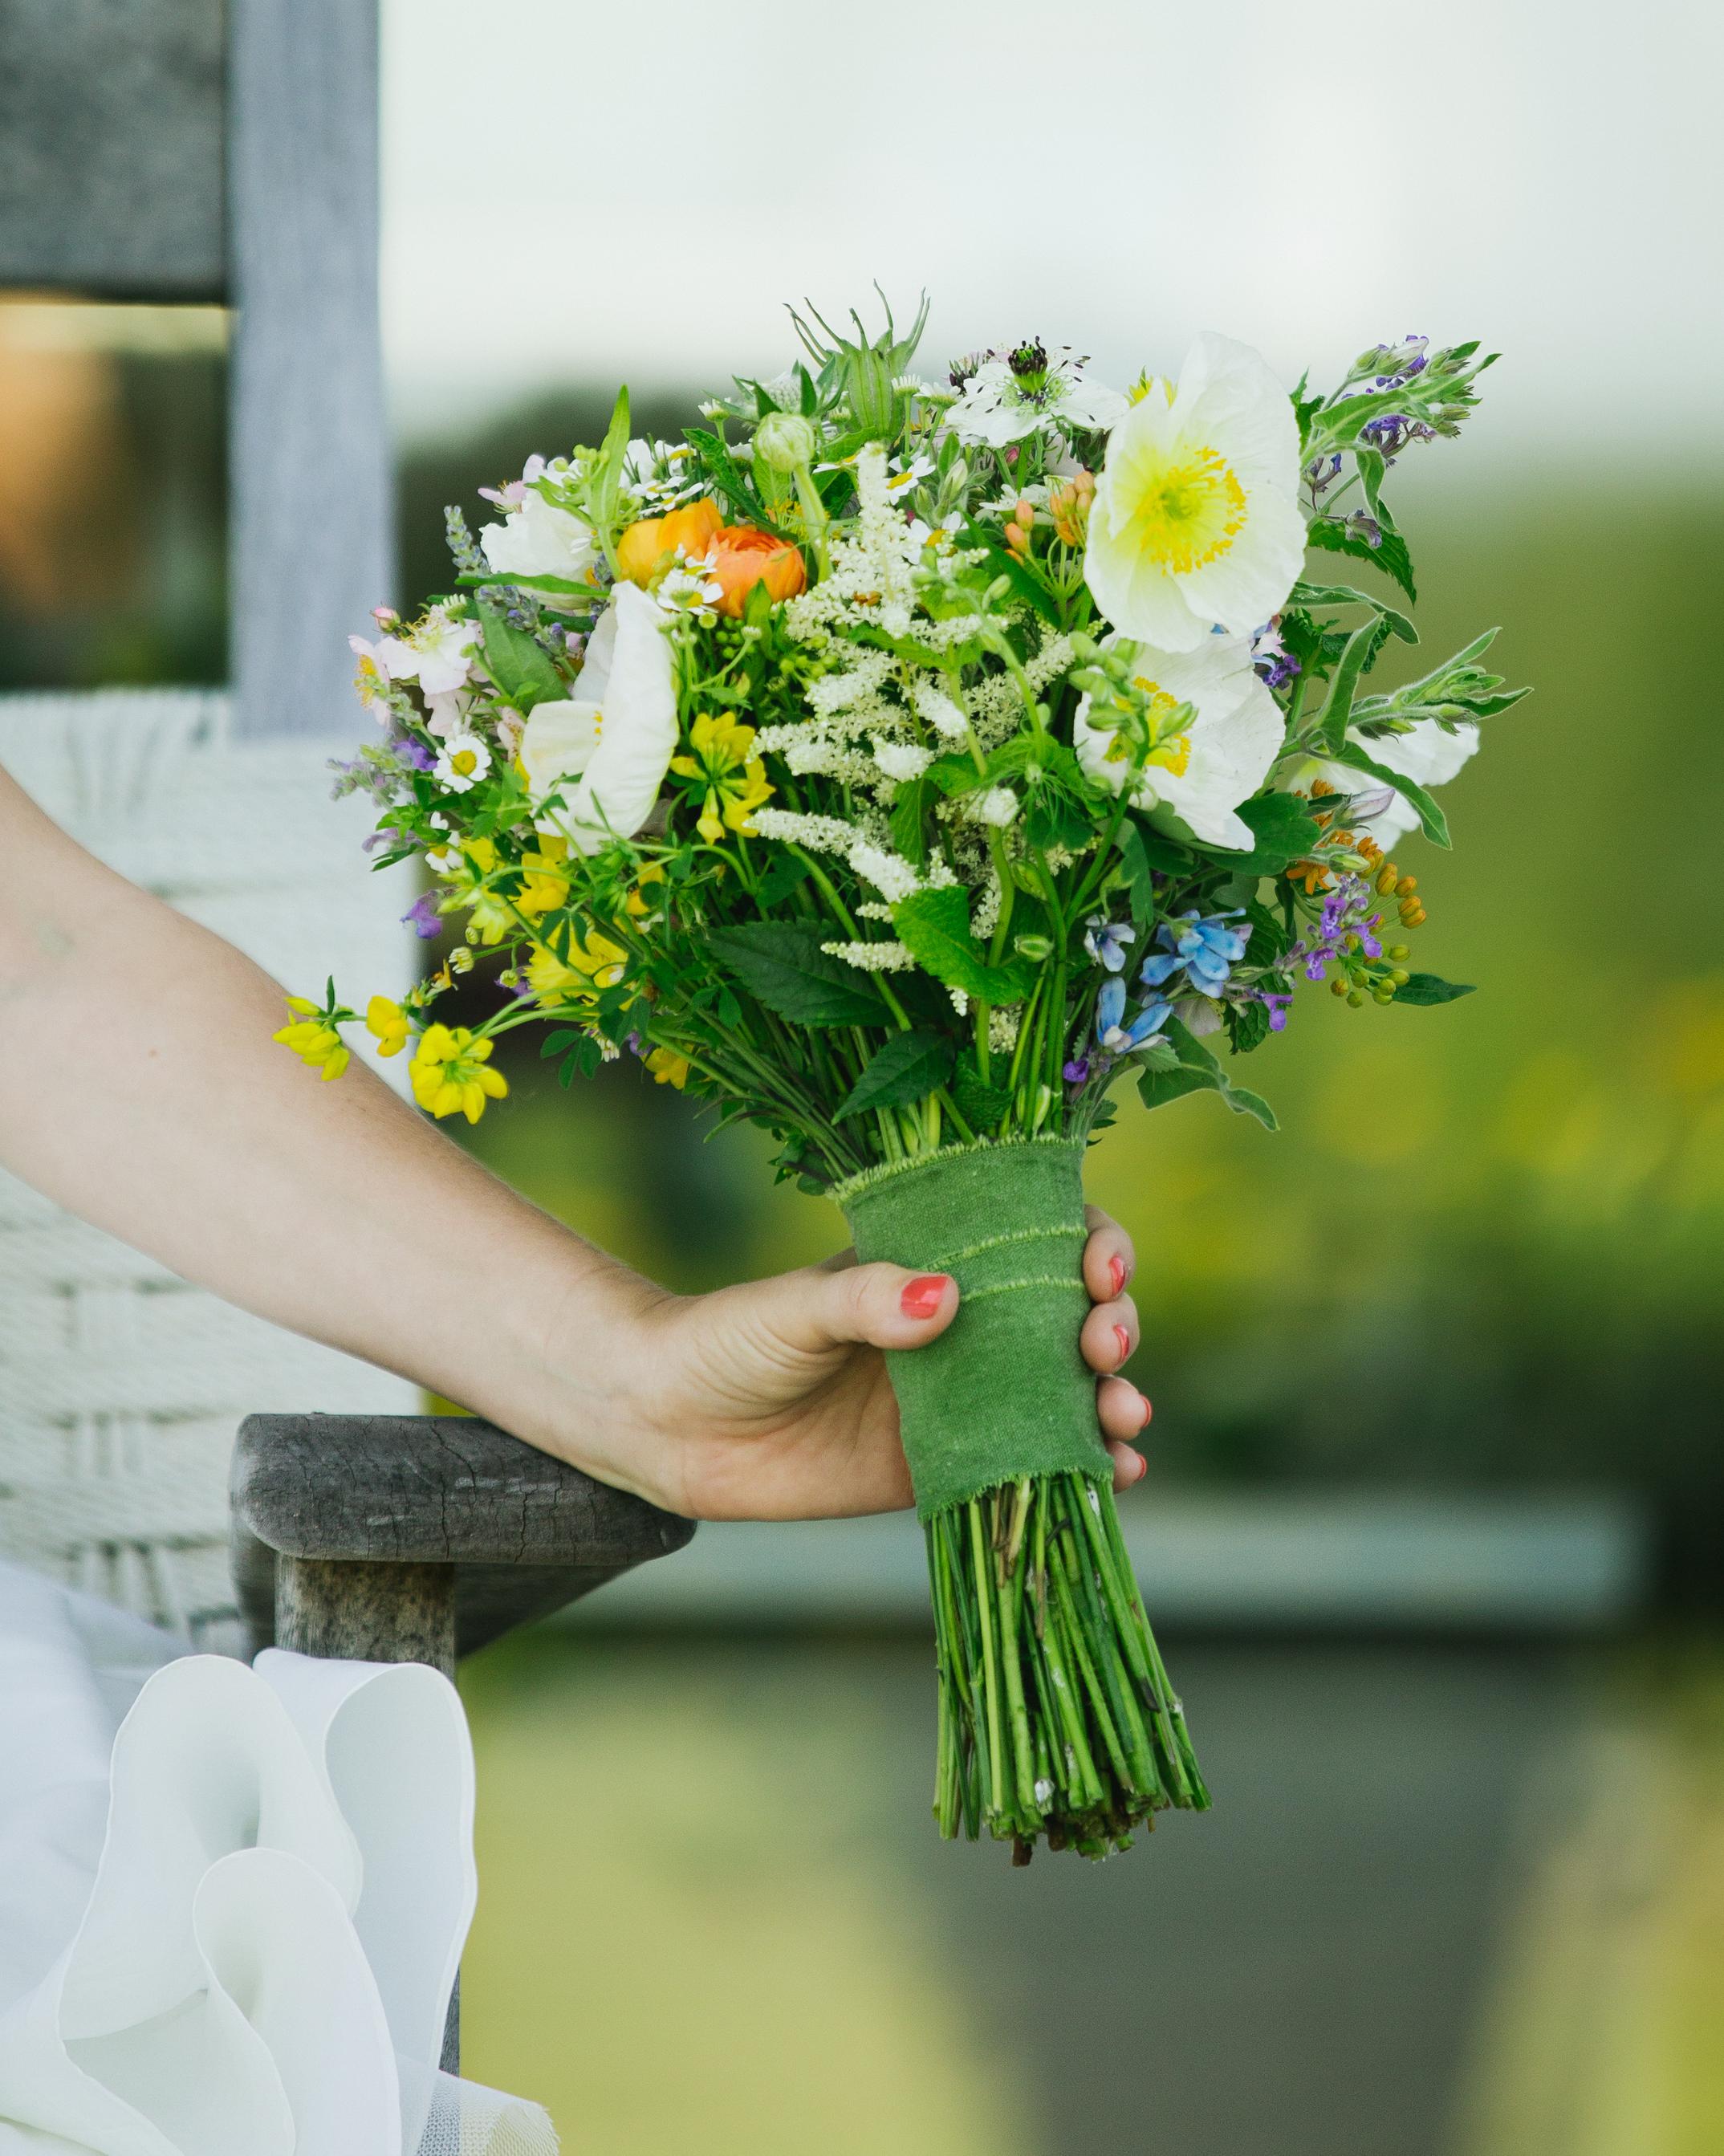 gabriela-tyson-wedding-bouquet-0241-s111708-1214.jpg